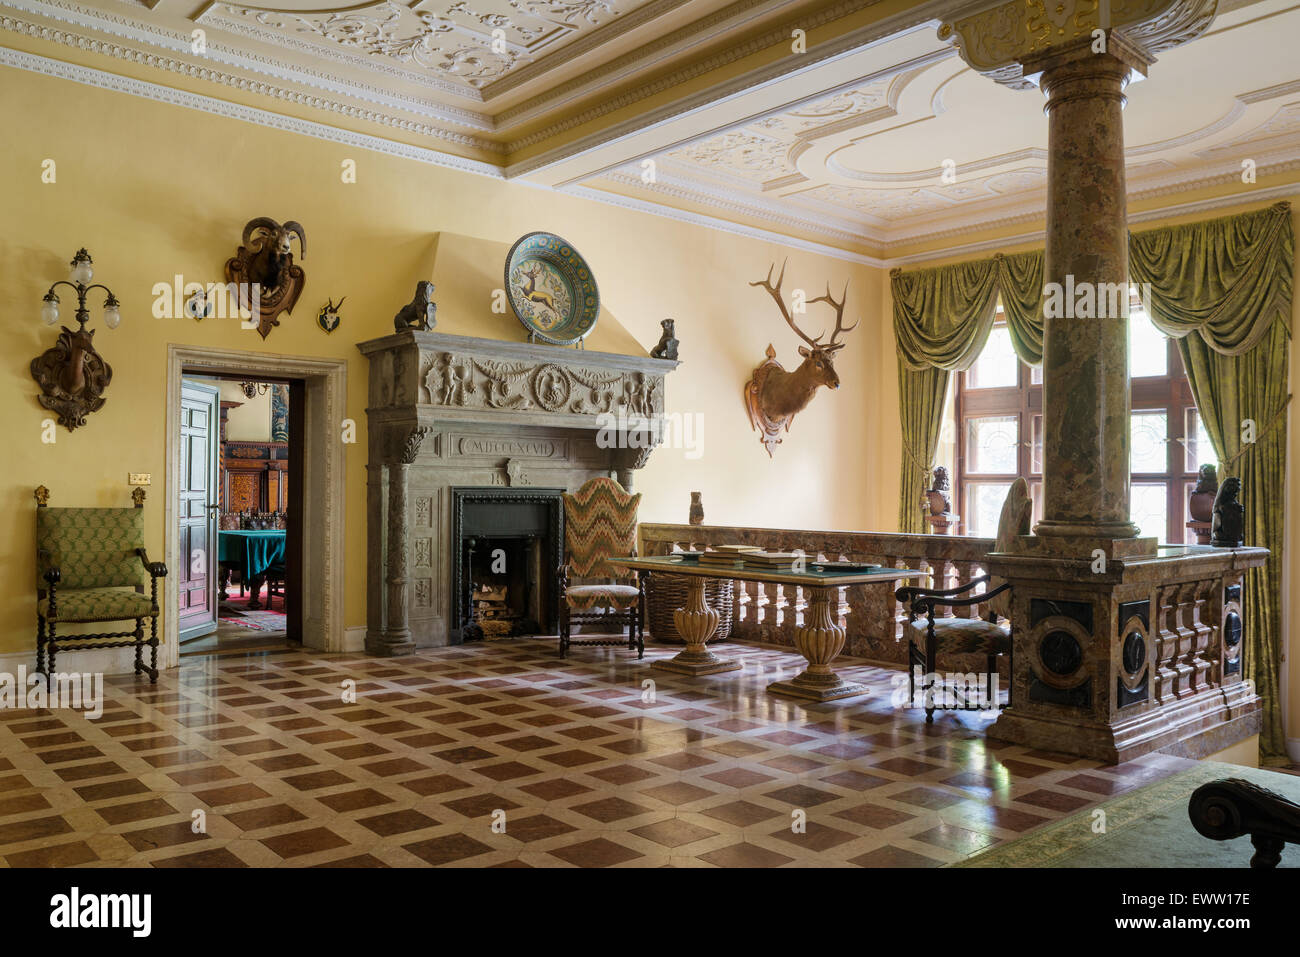 Large Stone Fireplace large stone fireplace in castle hallway with marble flooring